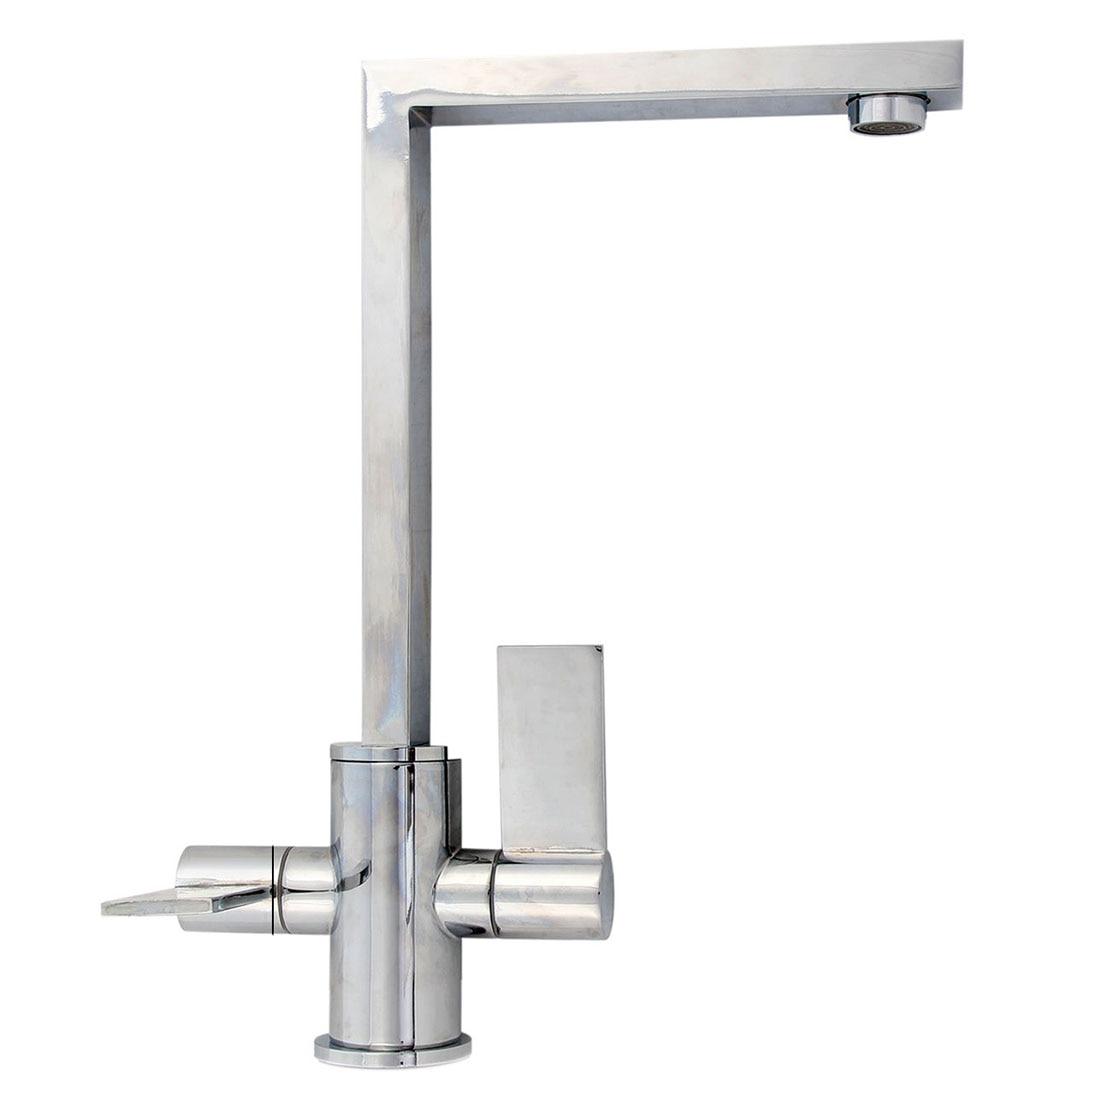 360 Mixer Tap Kitchen Sink Modern Angular Chrome Dual Lever Streamlined NEW